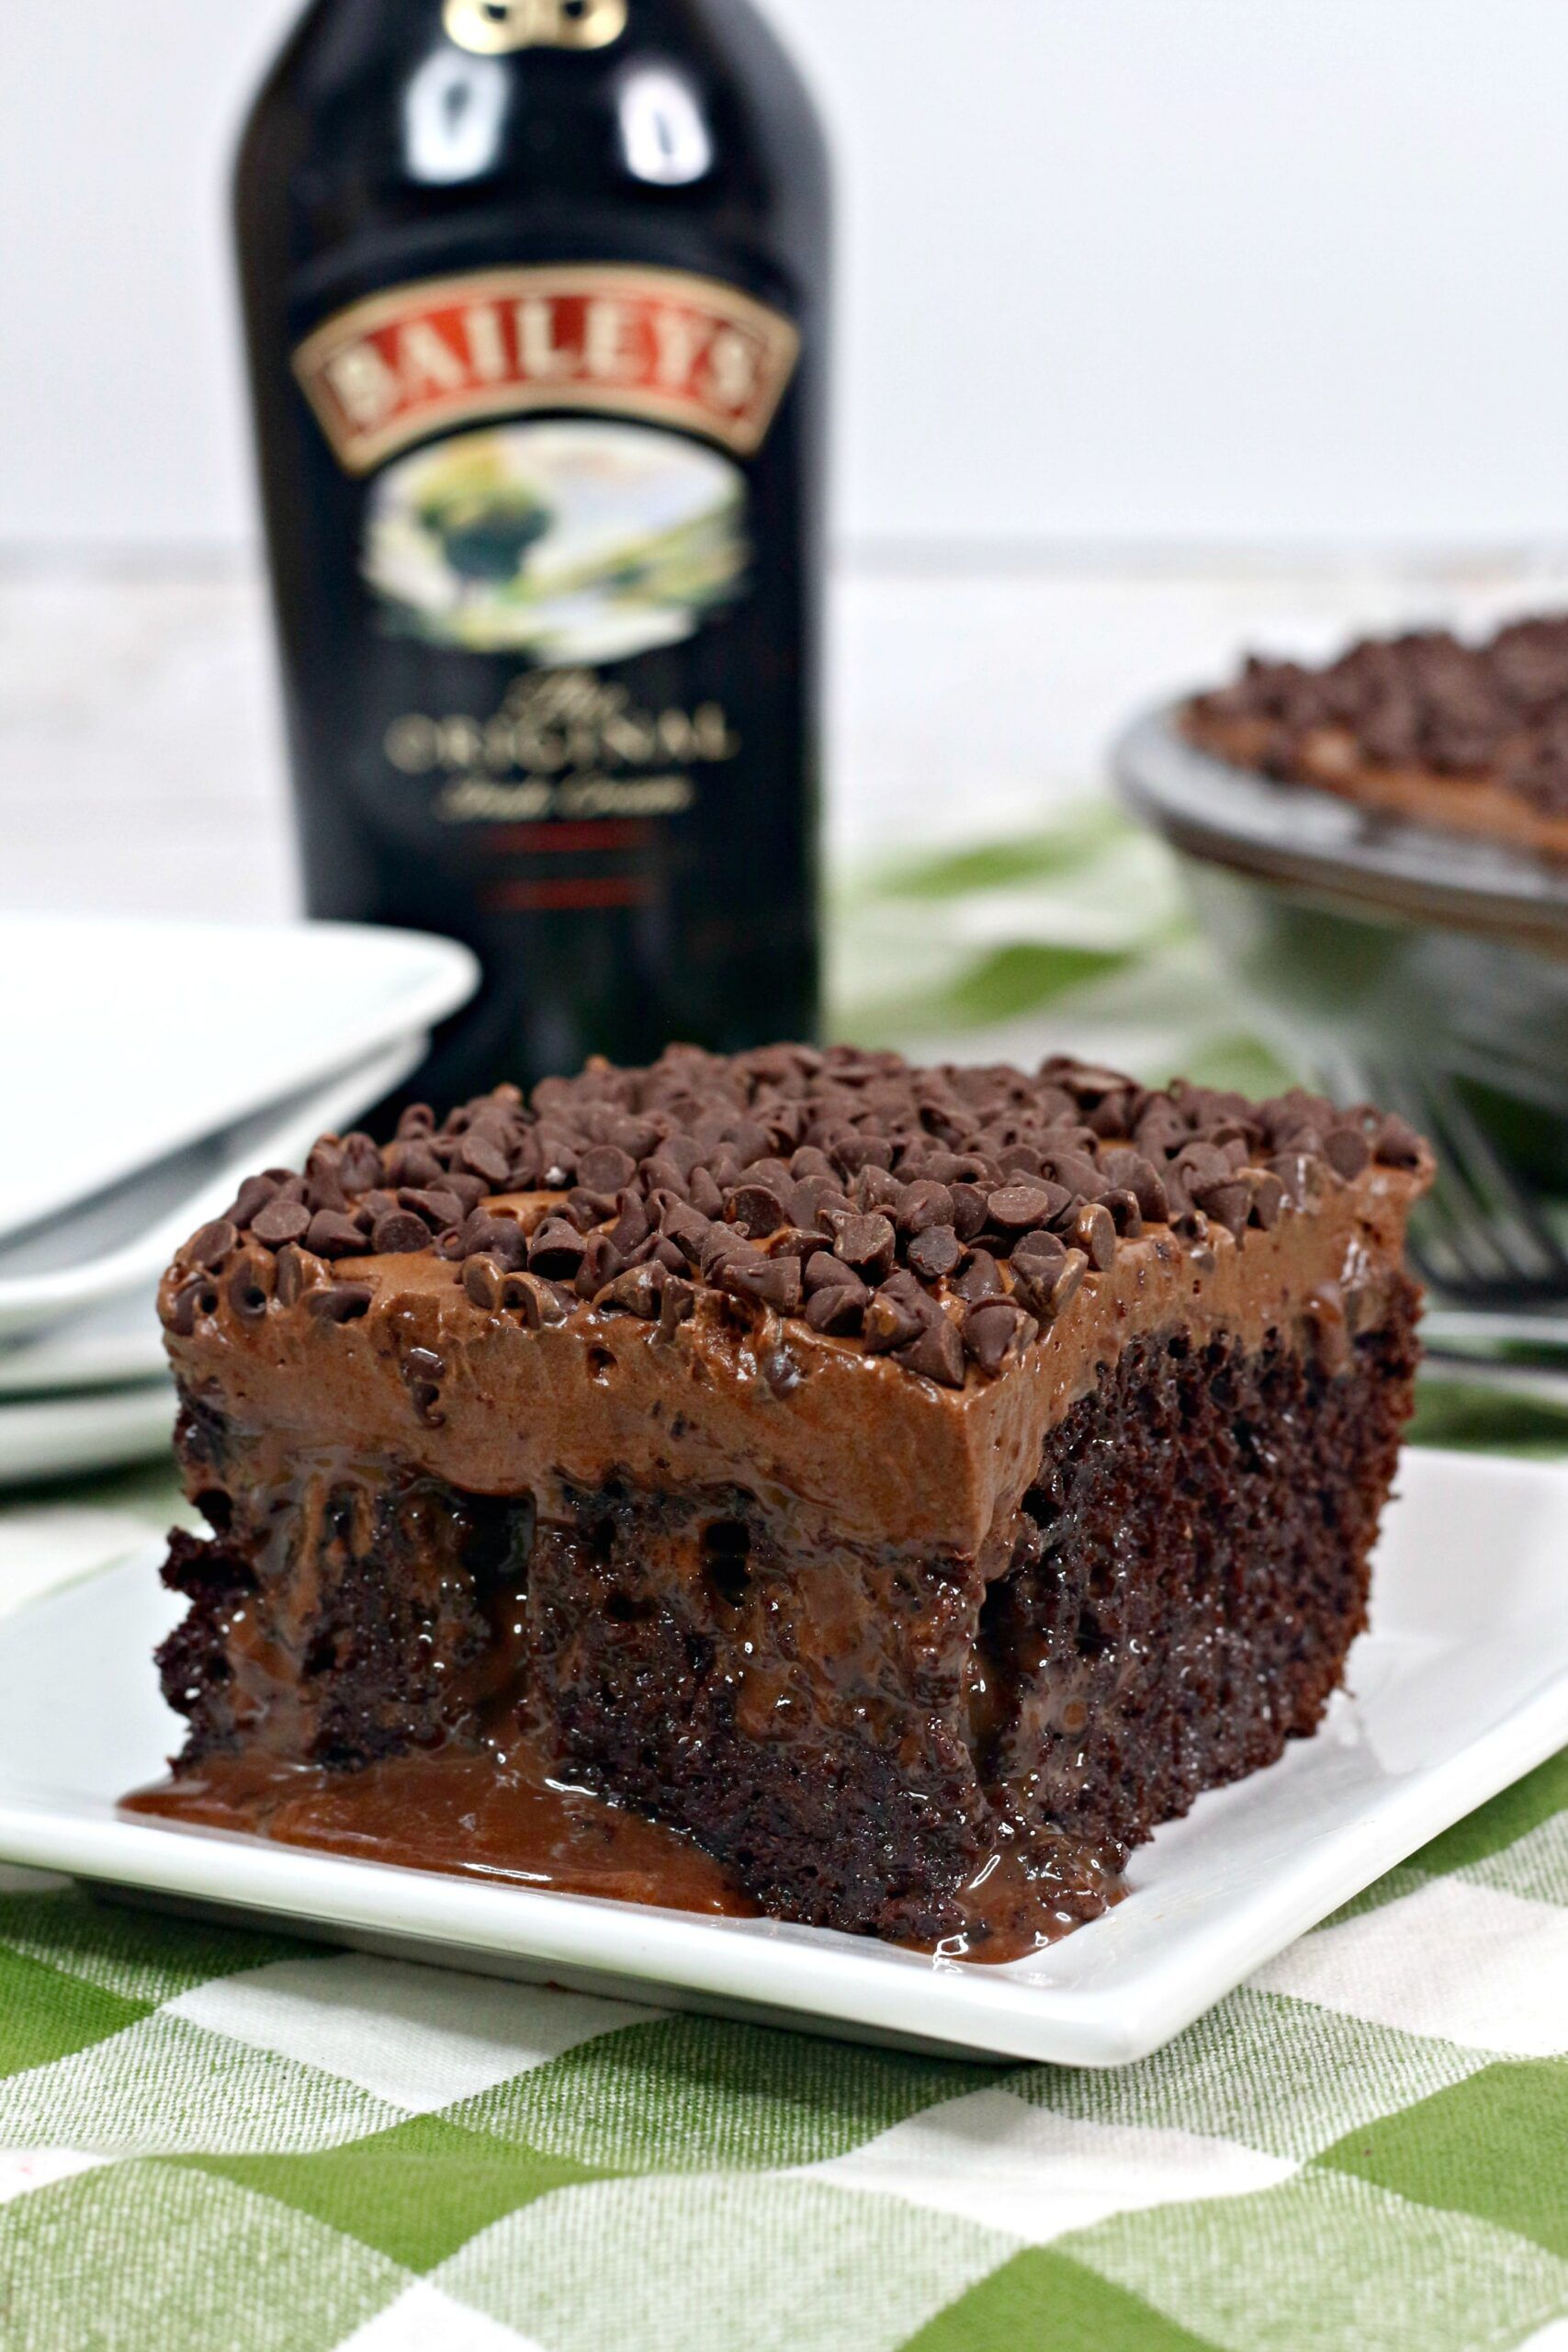 Baileys Irish Cream Chocolate Cake with Baileys Buttercream Frosting